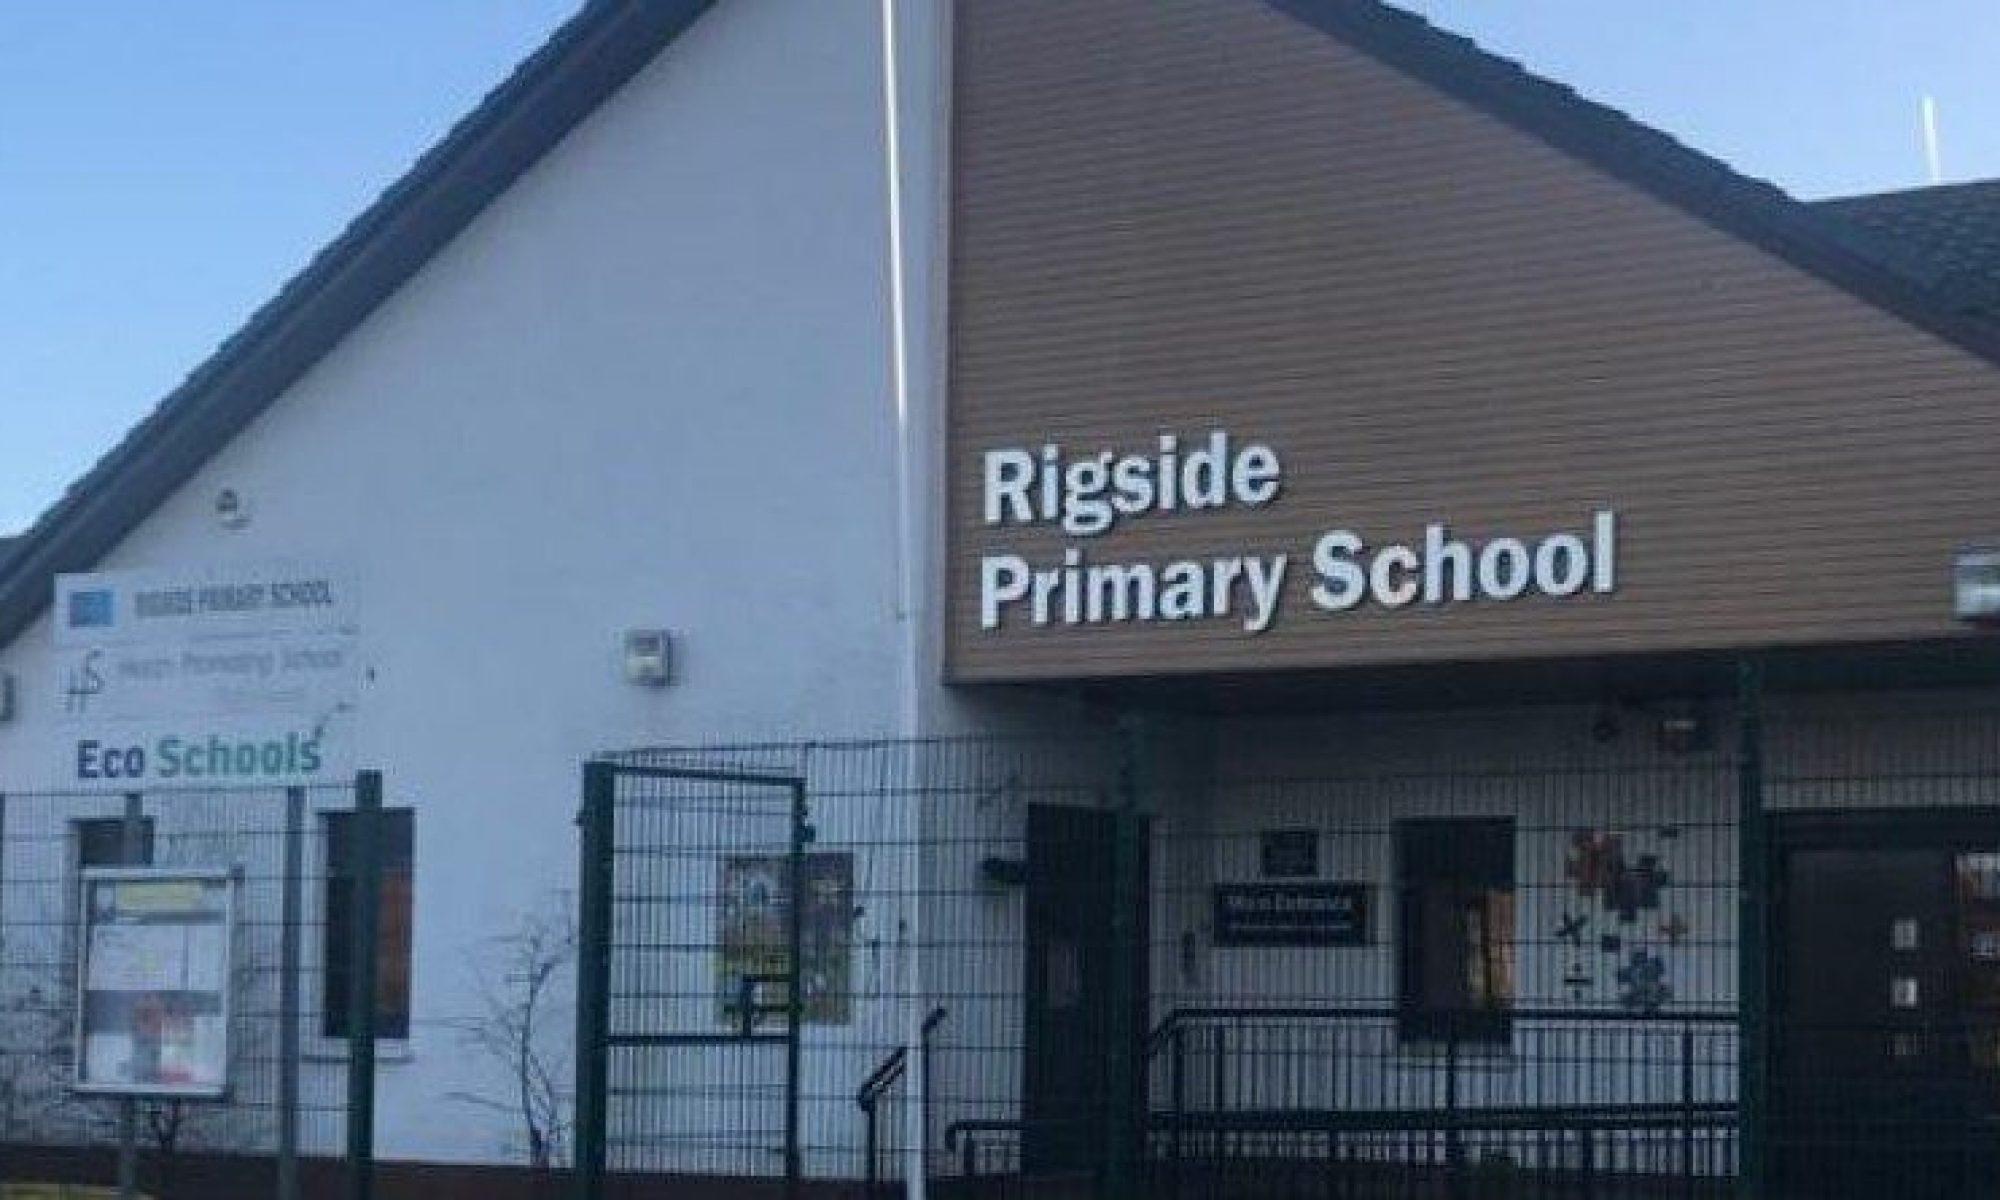 Rigside Primary School